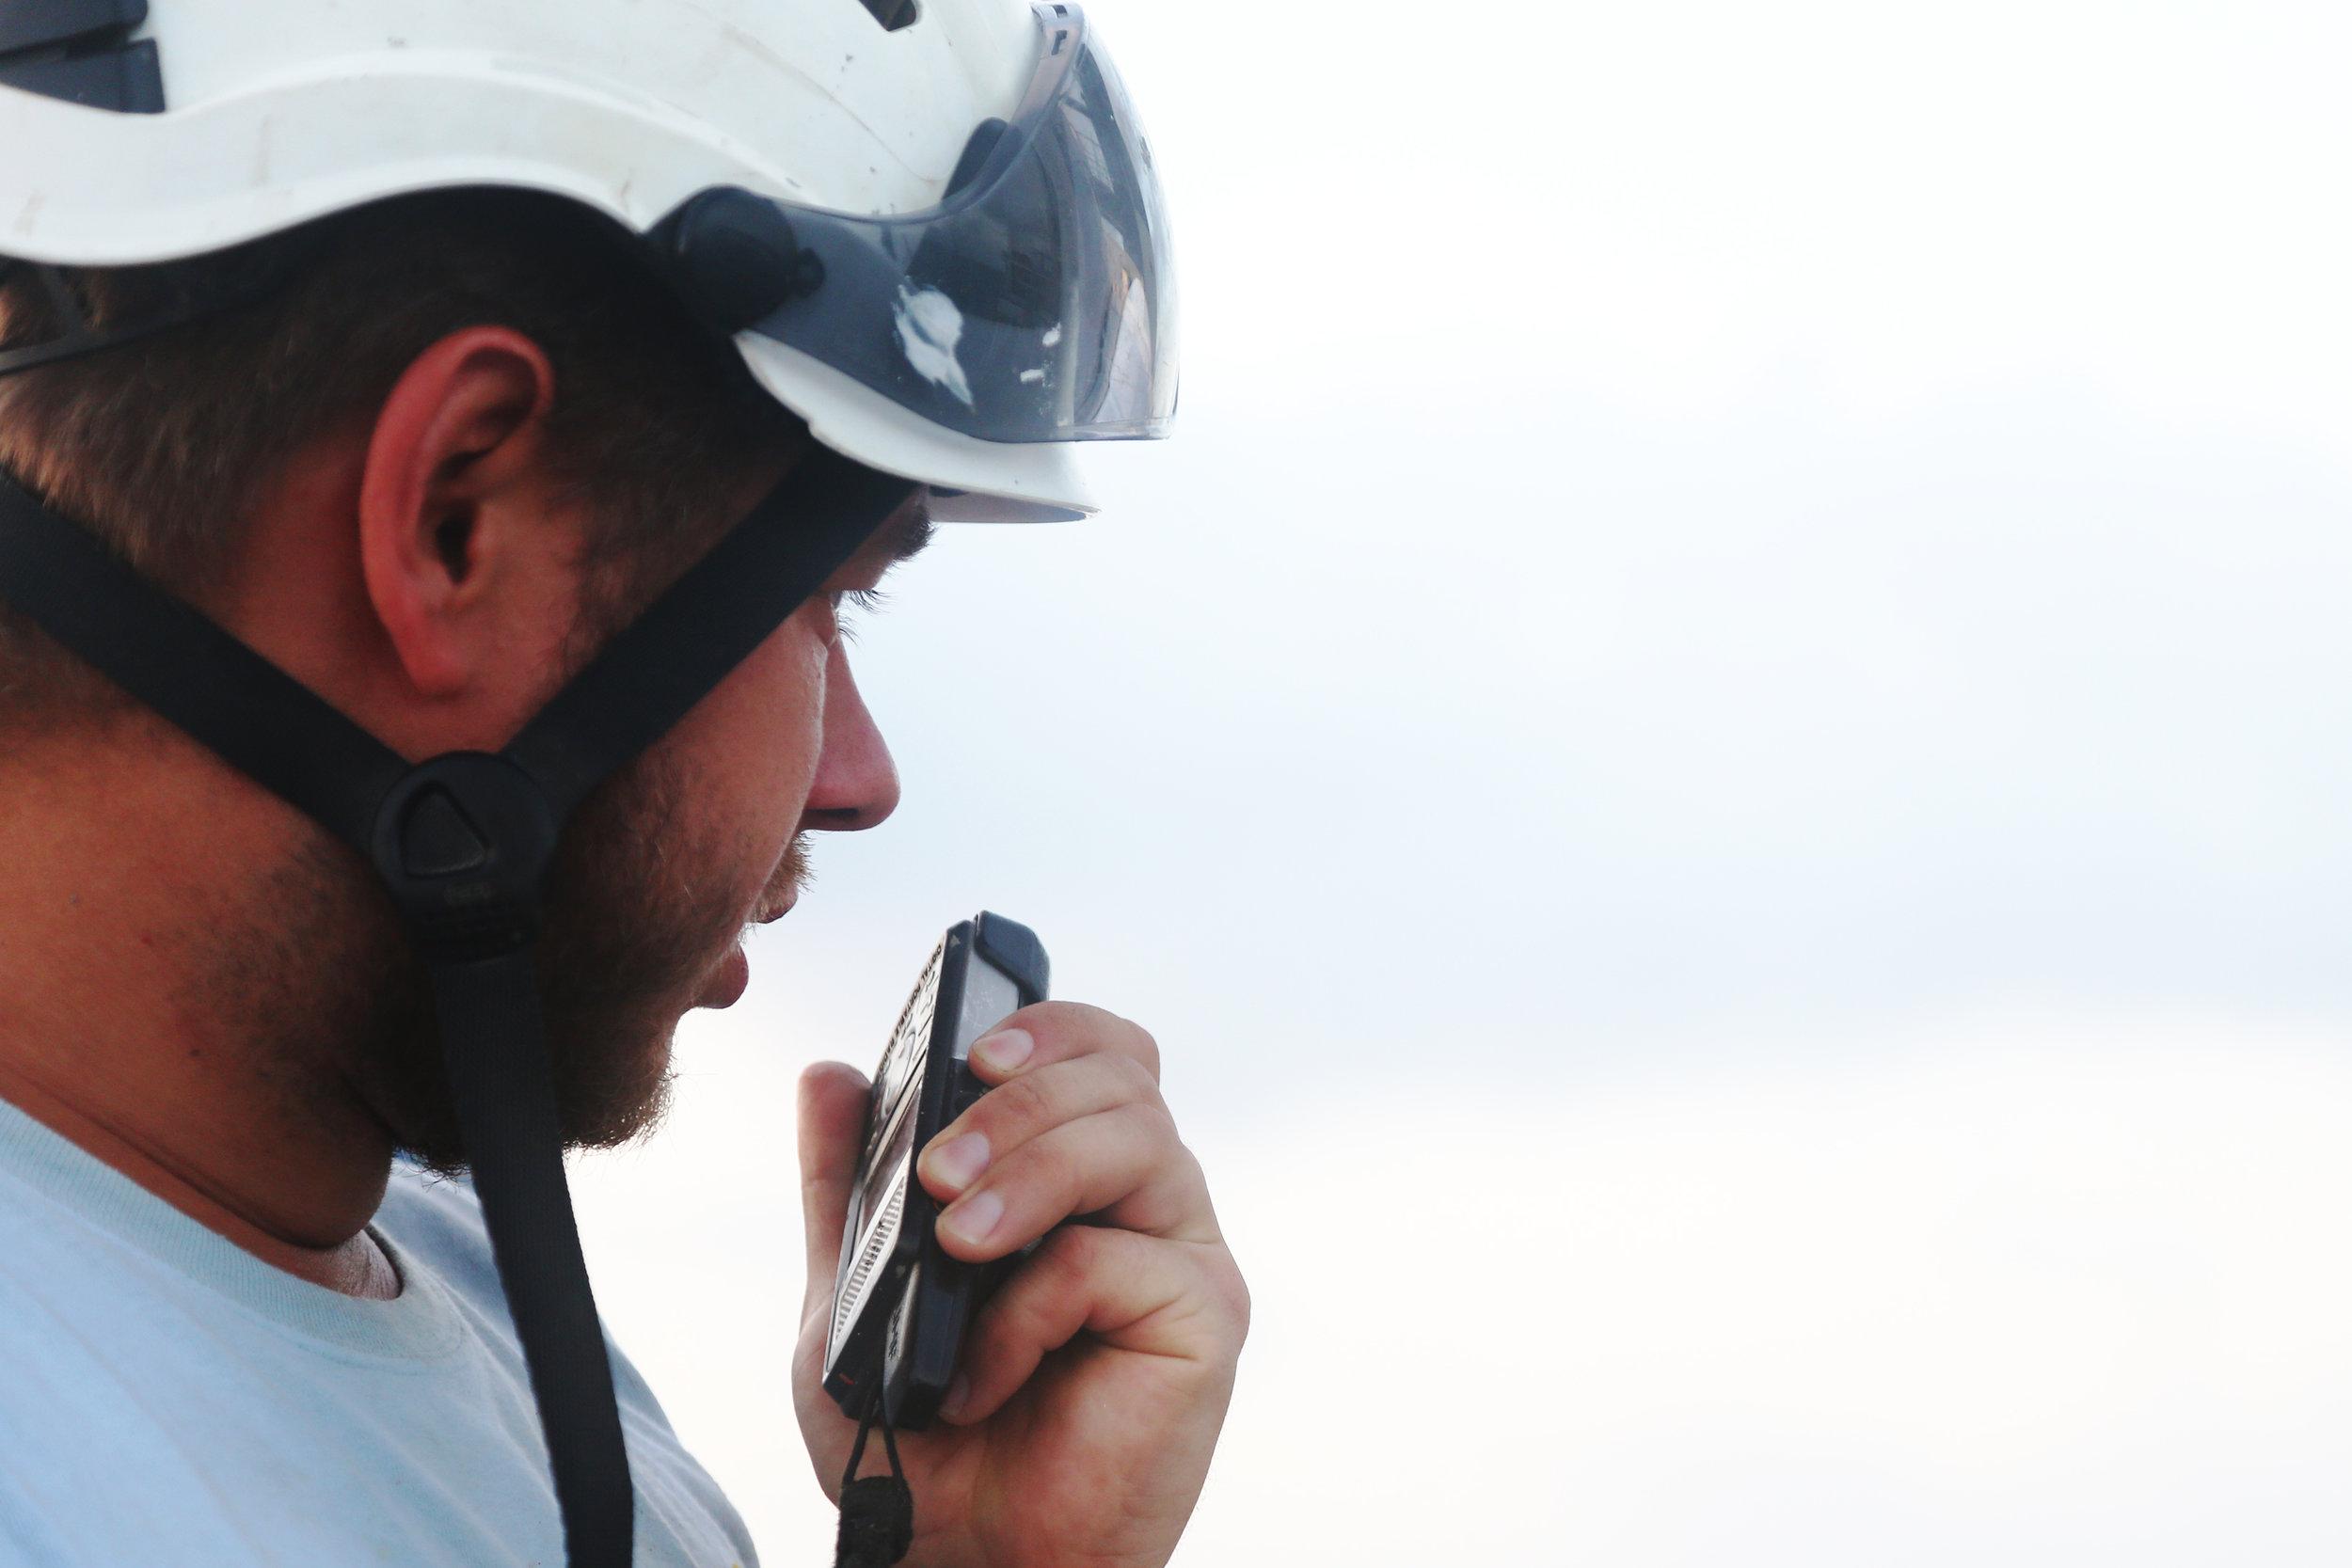 Go ahead.  Lead deckhand Michael Hans Schoenherr radios the bridge to report the CTD is in the water.